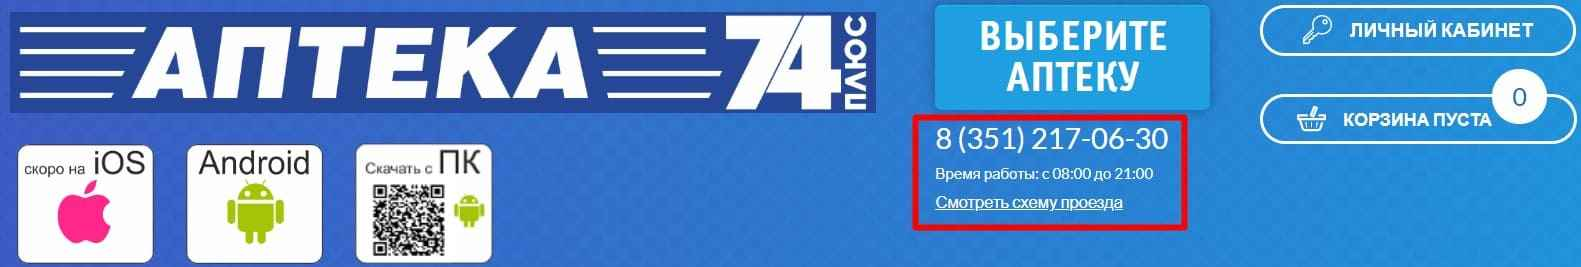 ЛК «Аптека 74 Плюс»